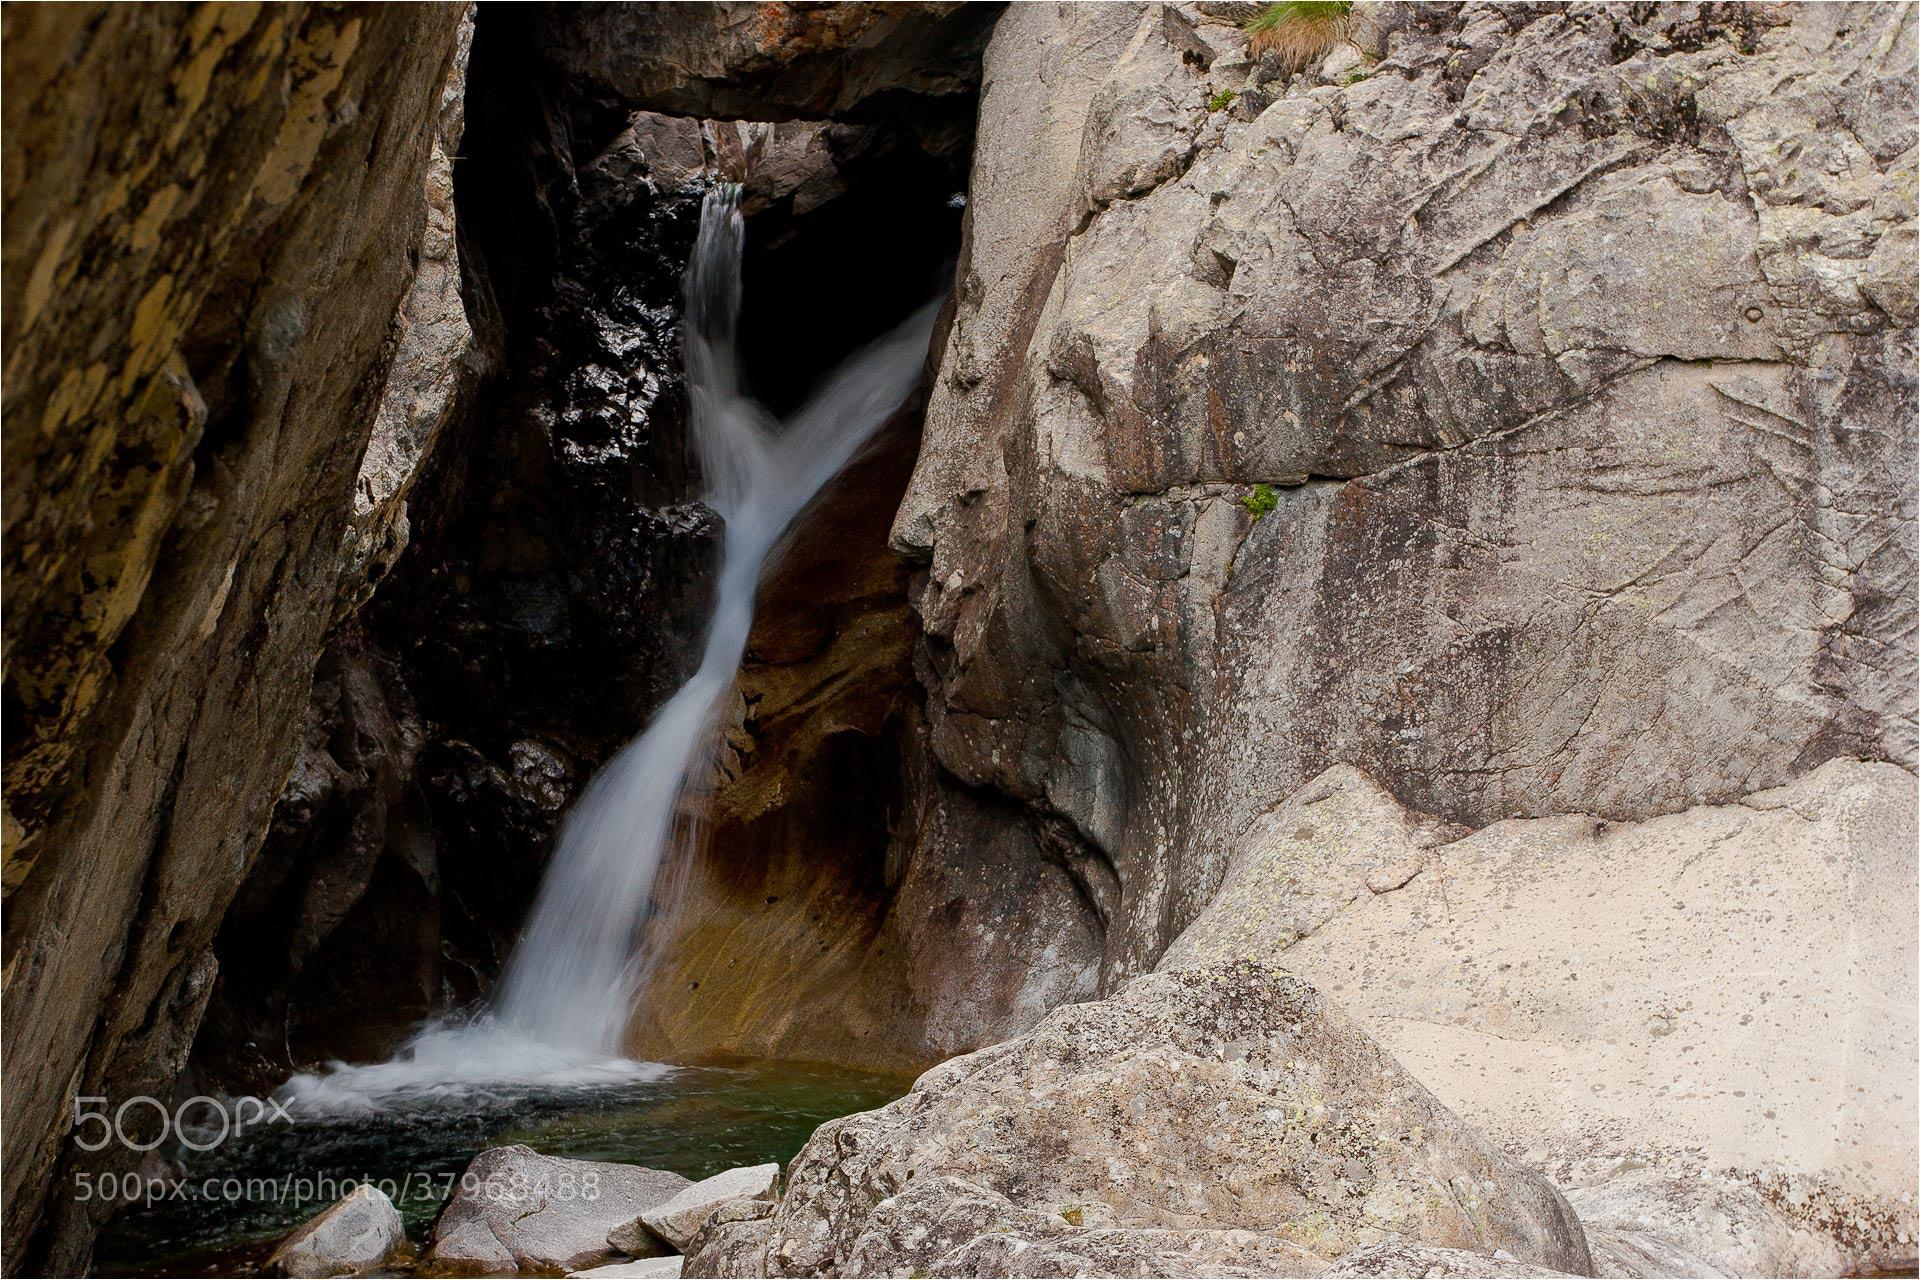 Photograph Bco. del Caldares. (Huesca) by Ferran Cartagena  on 500px